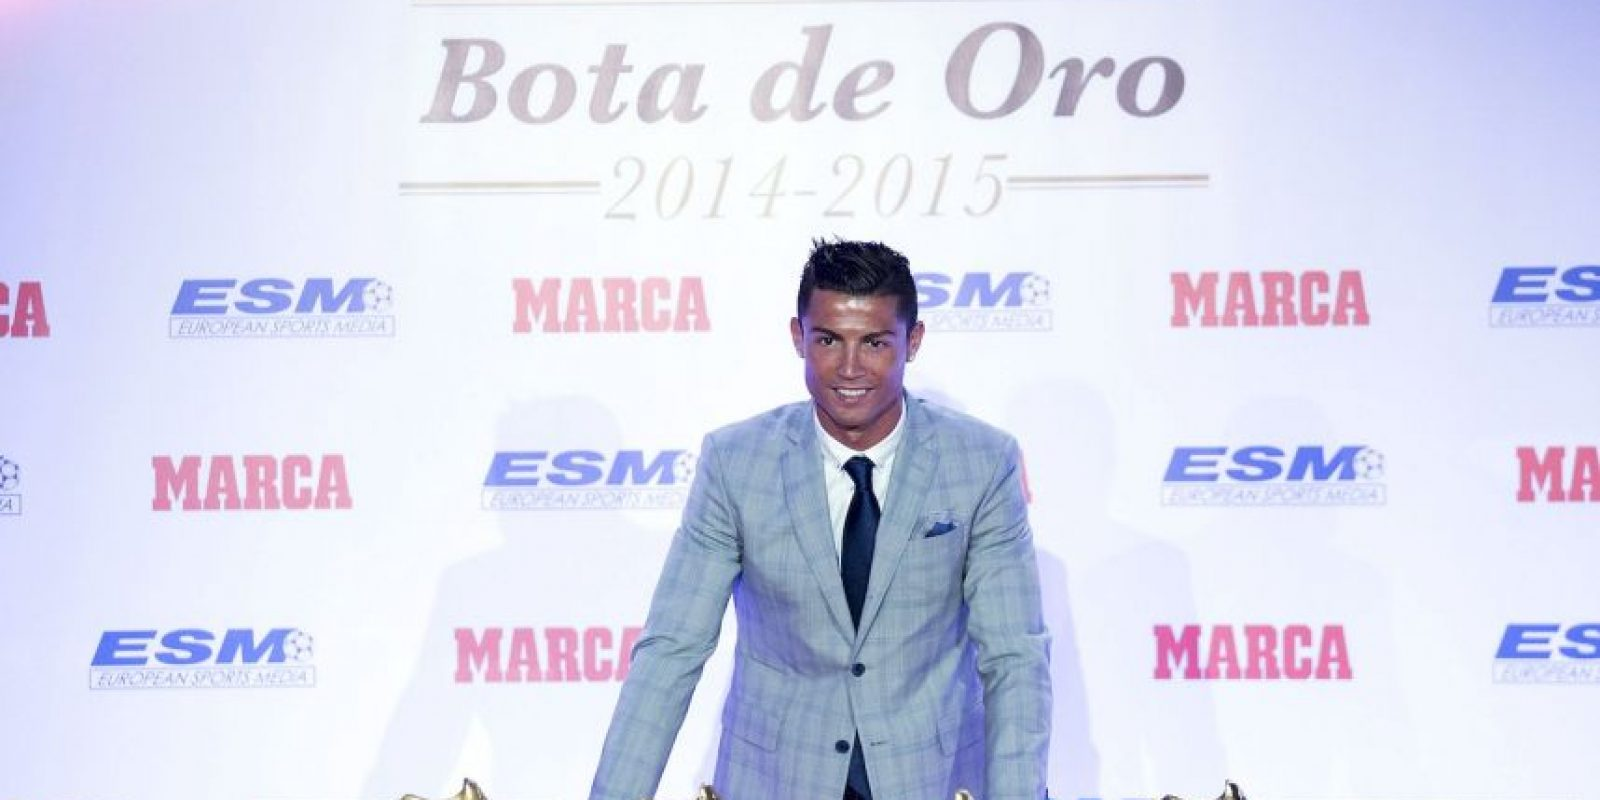 Cristiano Ronaldo – Real Madrid (2014/15) Foto:Getty Images